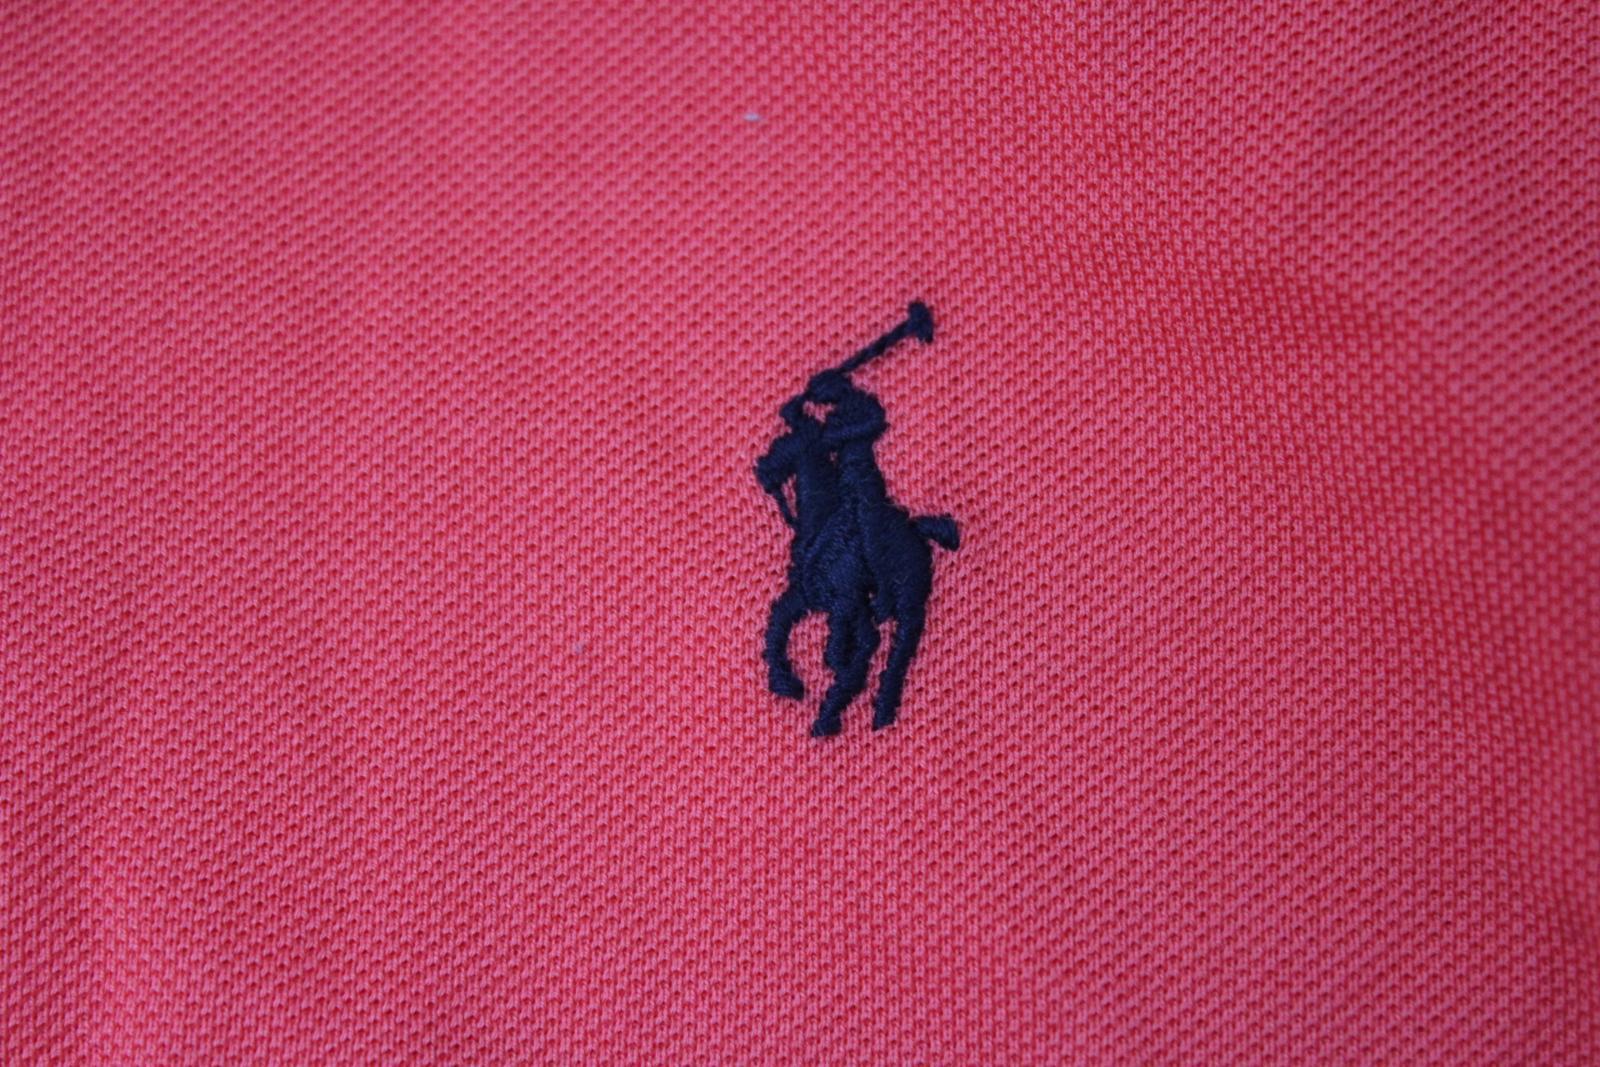 Ralph-Lauren-Polo-para-hombre-de-color-rosa-de-algodon-Manga-Corta-Camisa-Polo-De-Ajuste miniatura 7